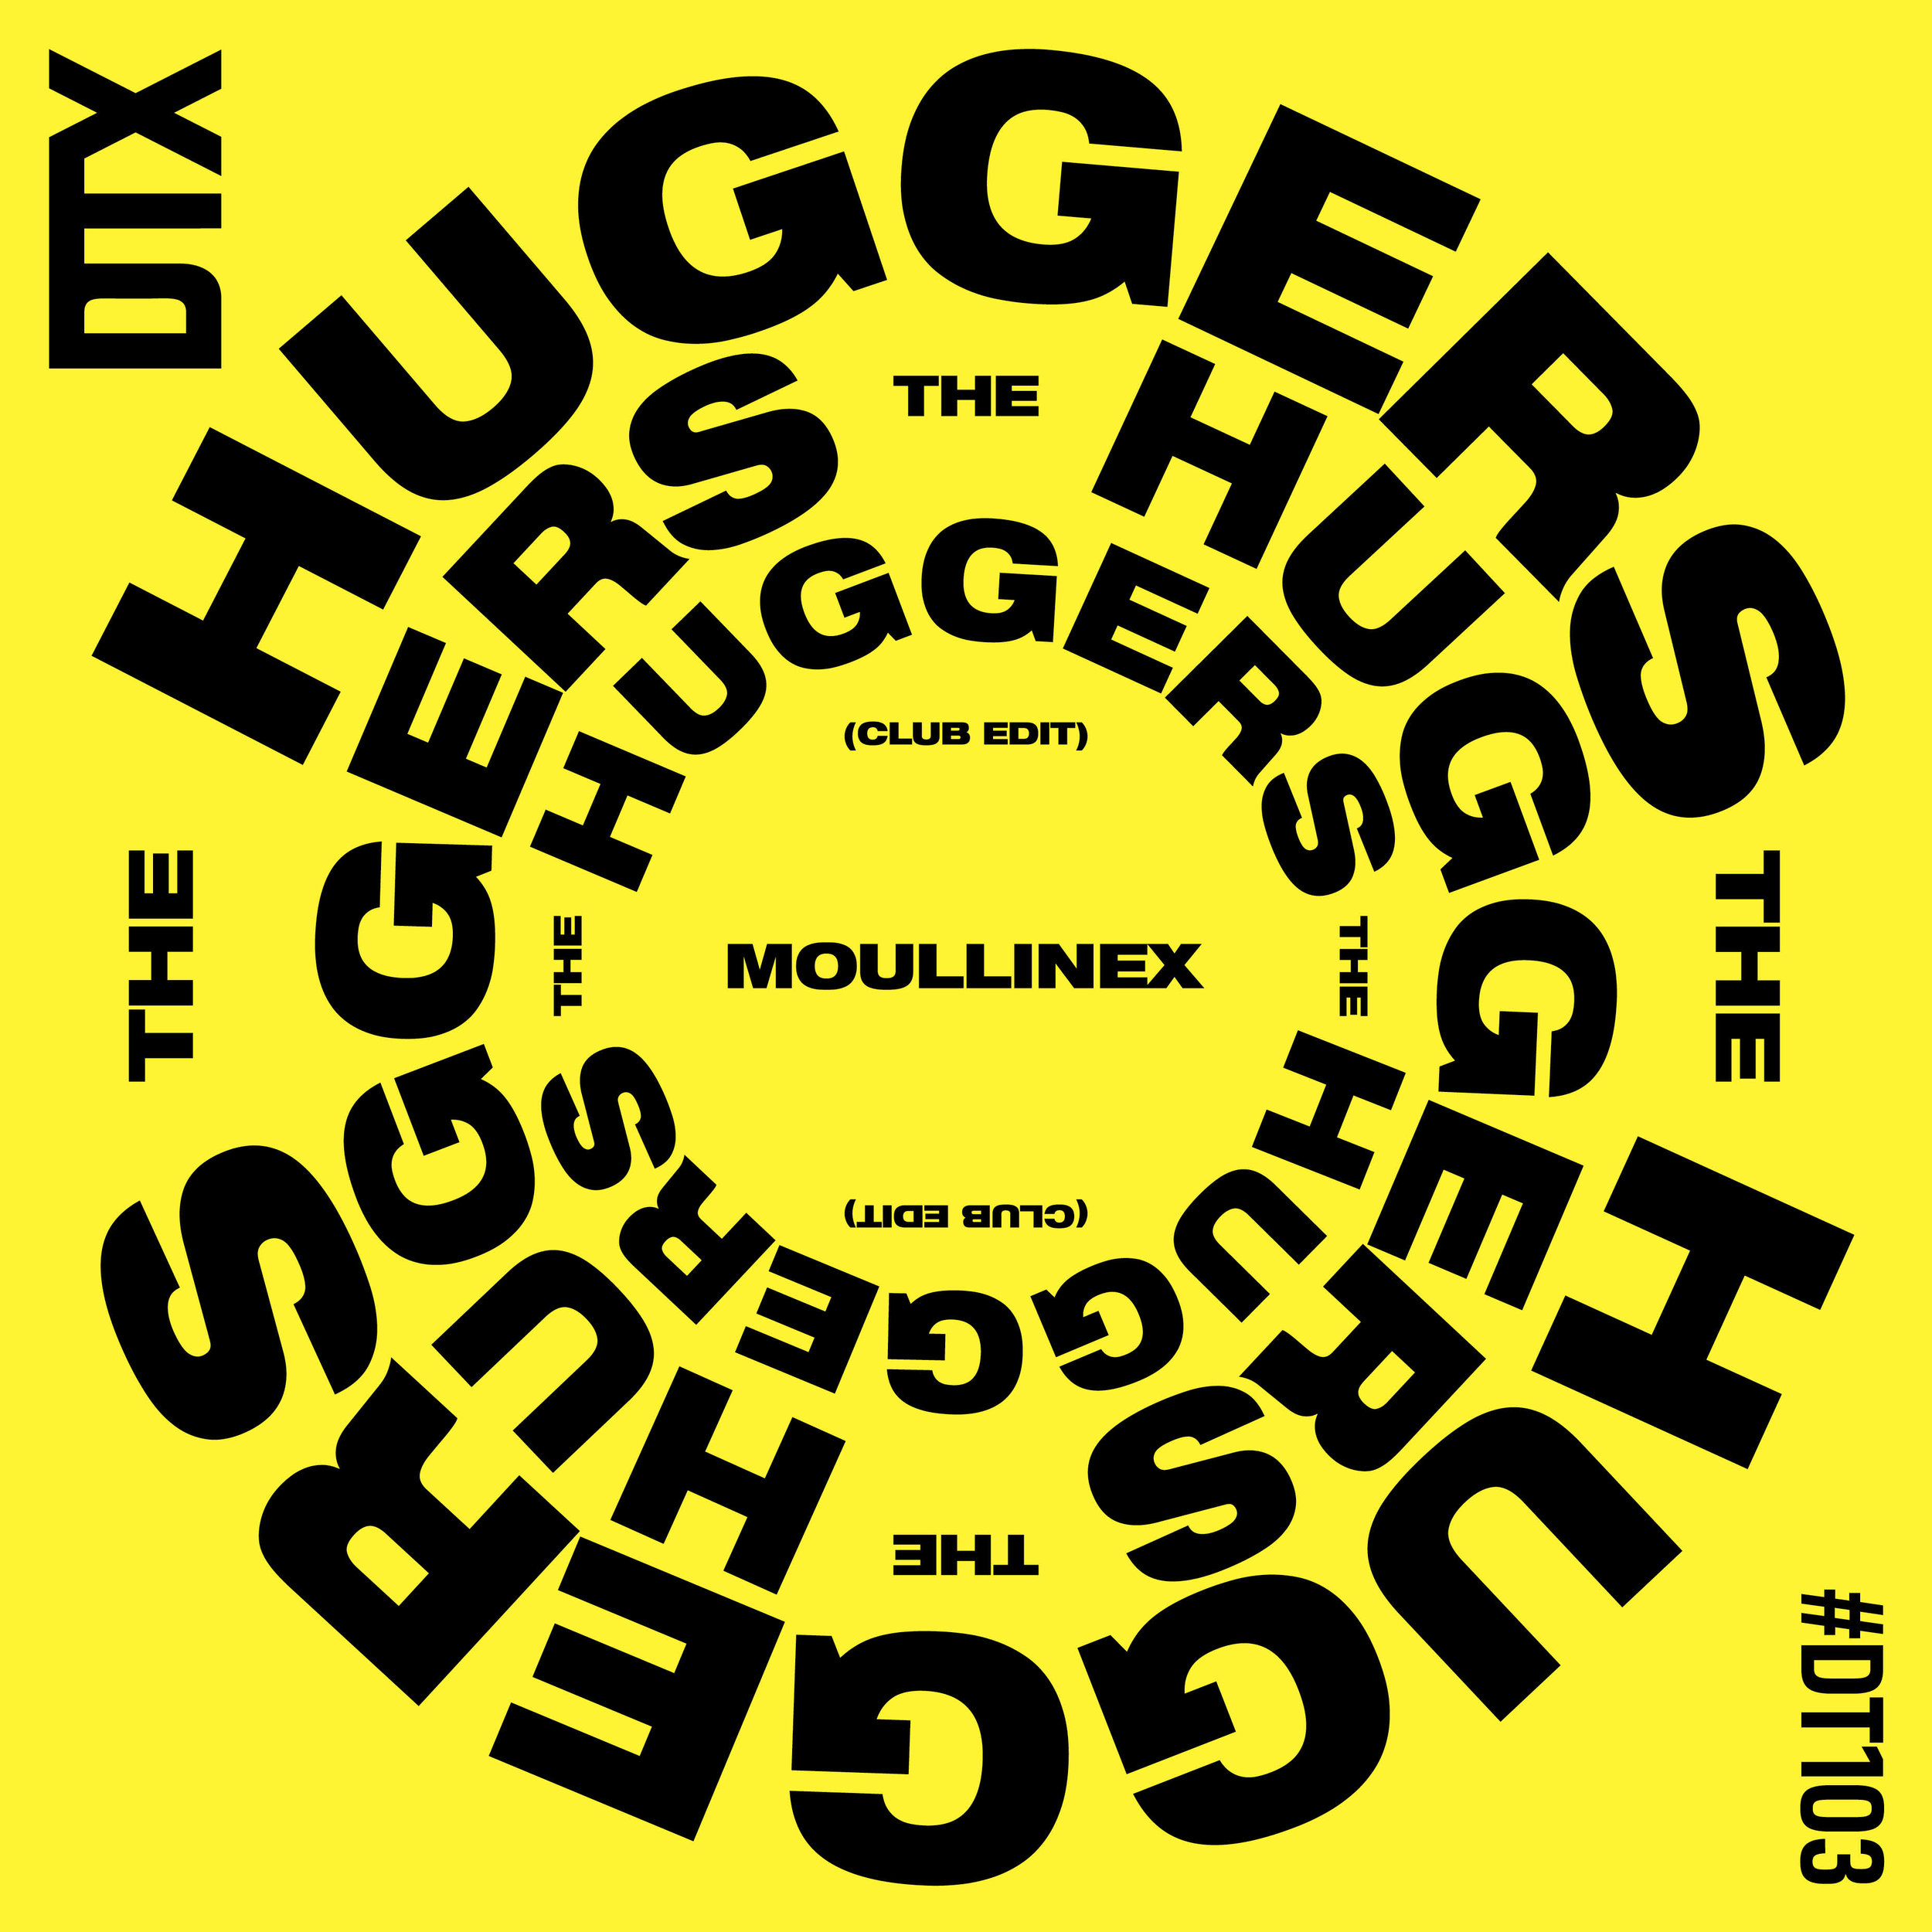 DT103: Moullinex - The Huggers (Club Edit)